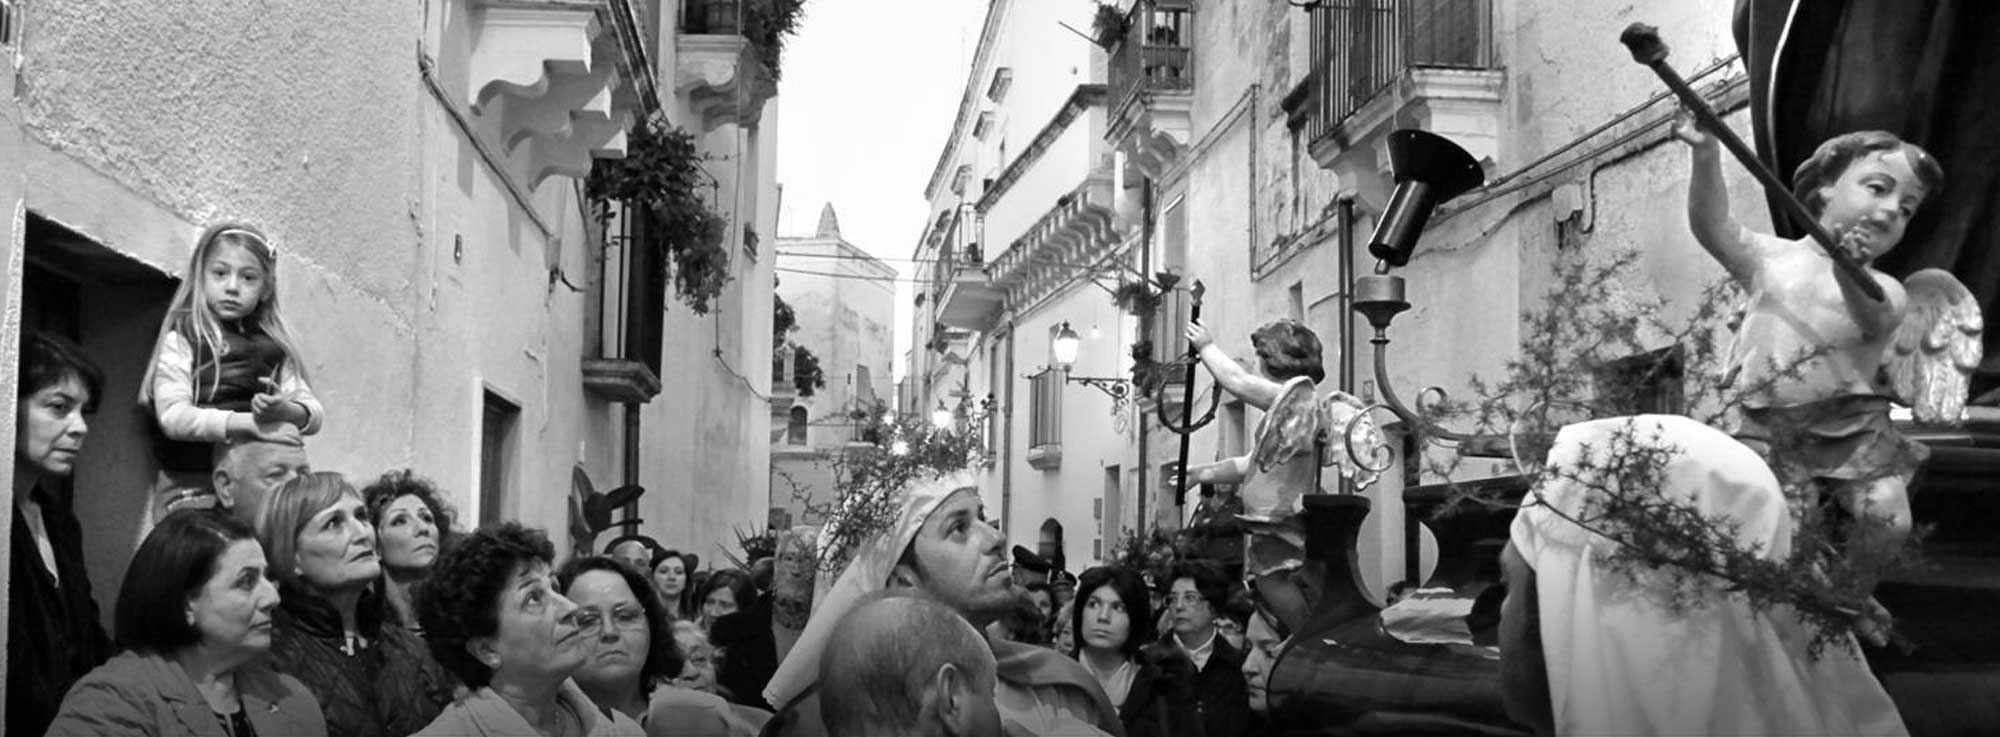 Grottaglie: Pàthos: la Settimana Santa a Grottaglie